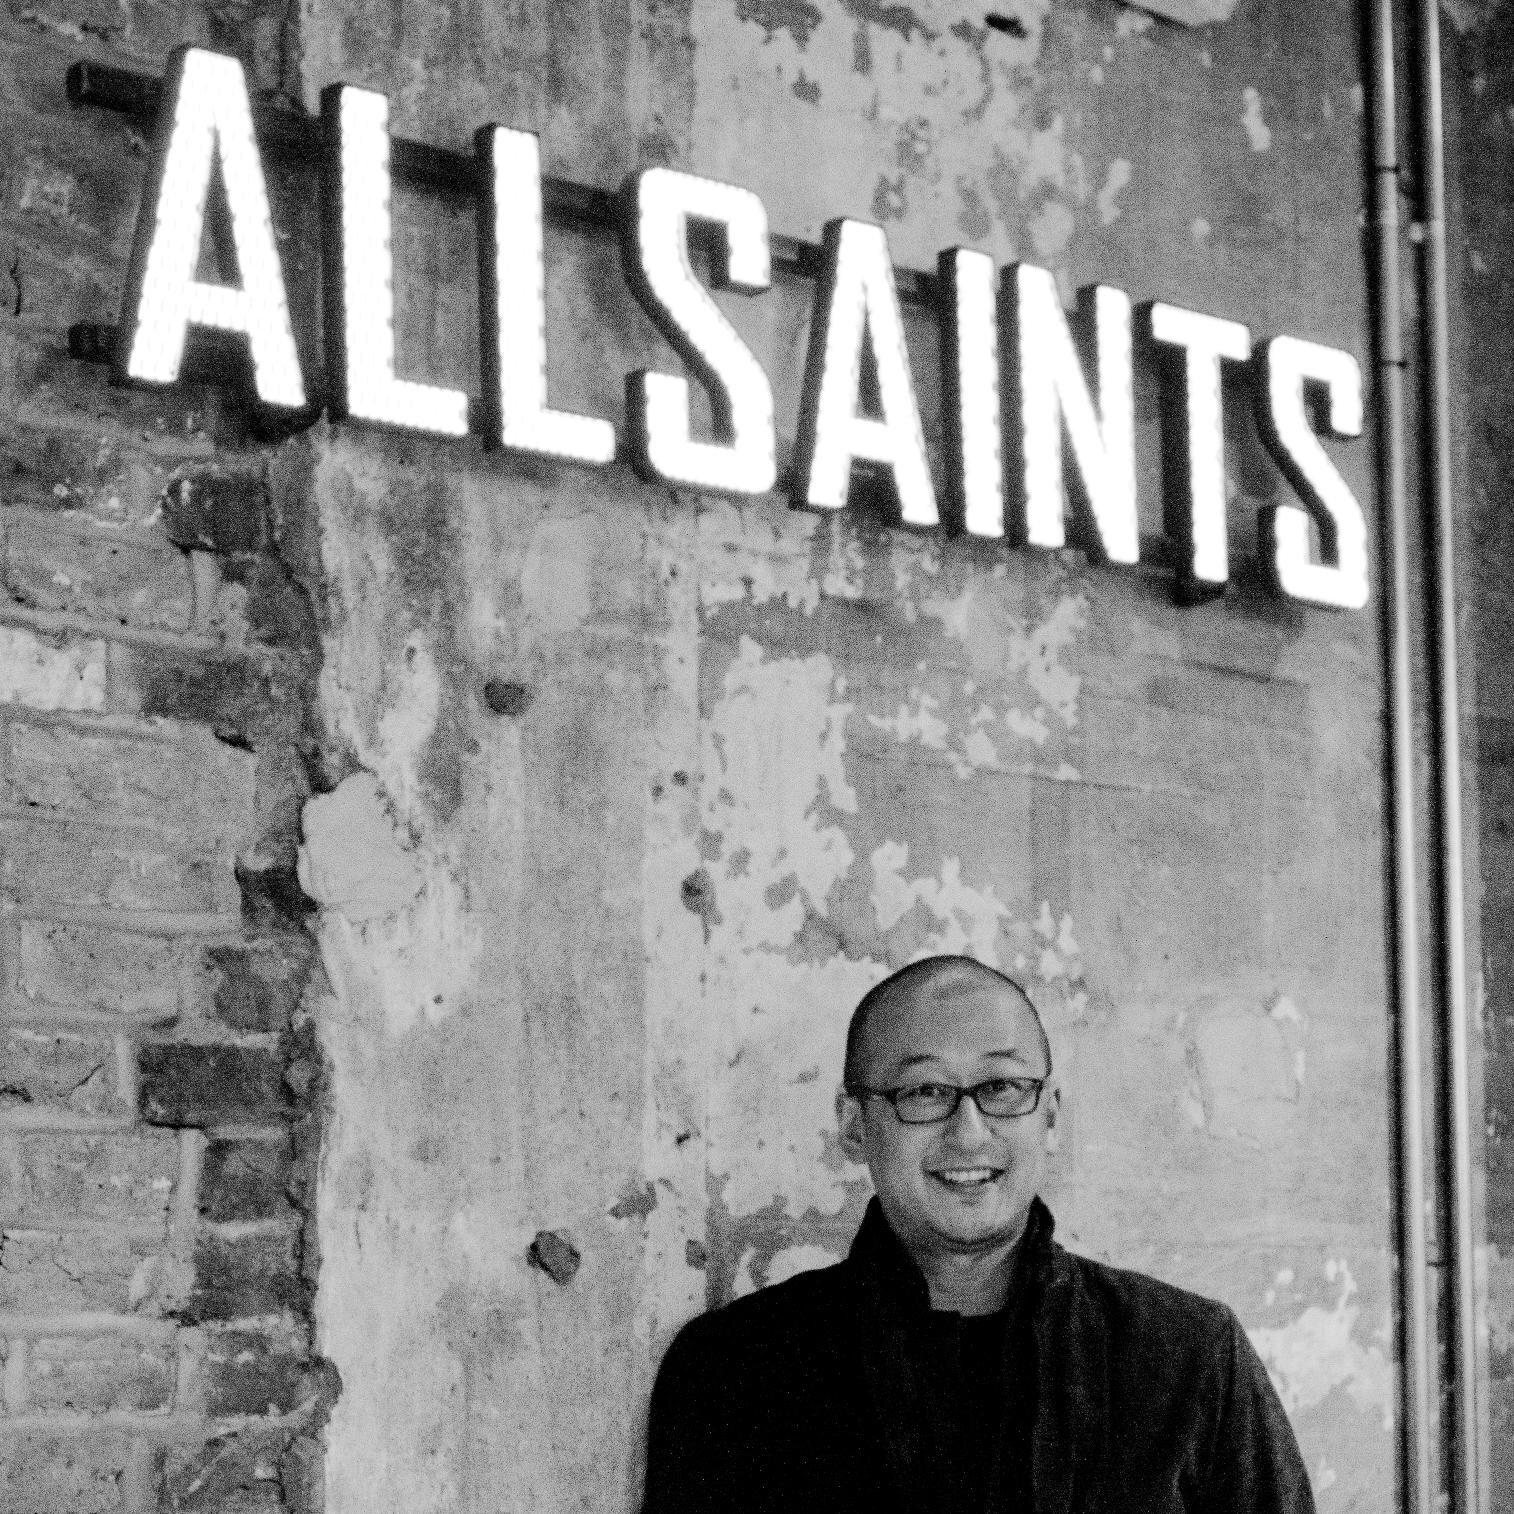 Image of Kim William, CEO of Allsaints. Source via: https://twitter.com/williampkim